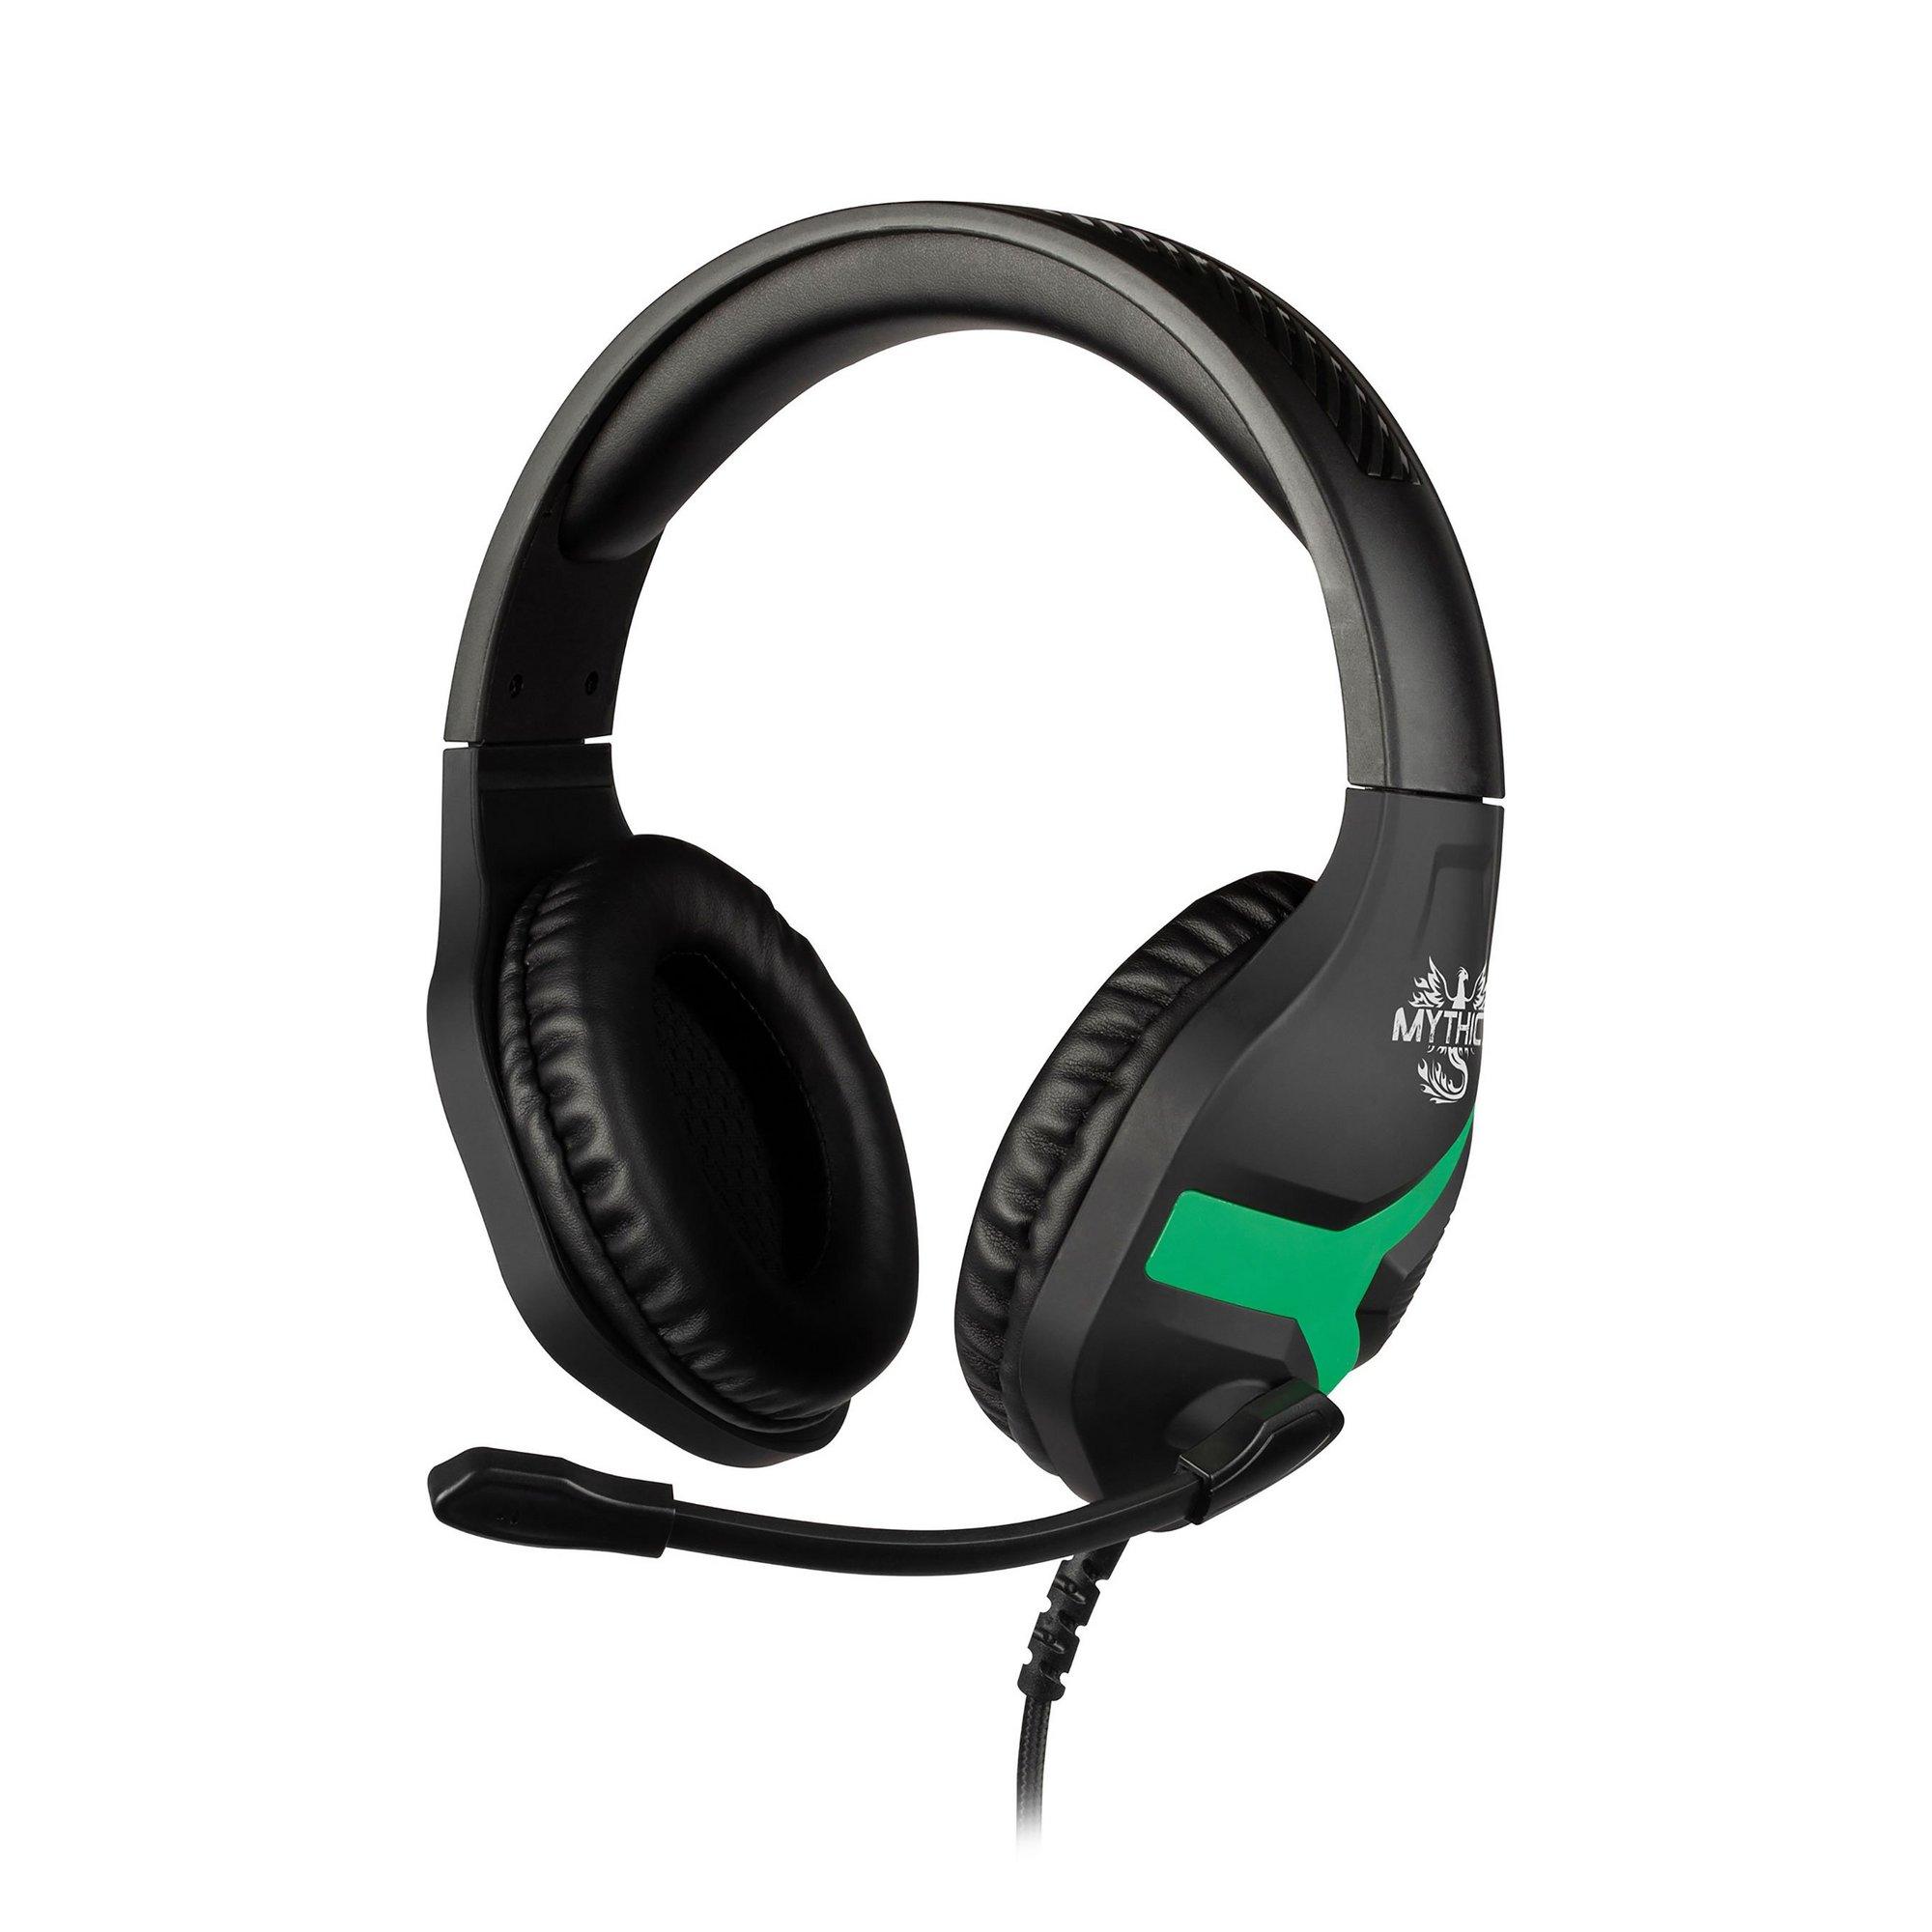 Image of Konix Nemesis Xbox One Headset